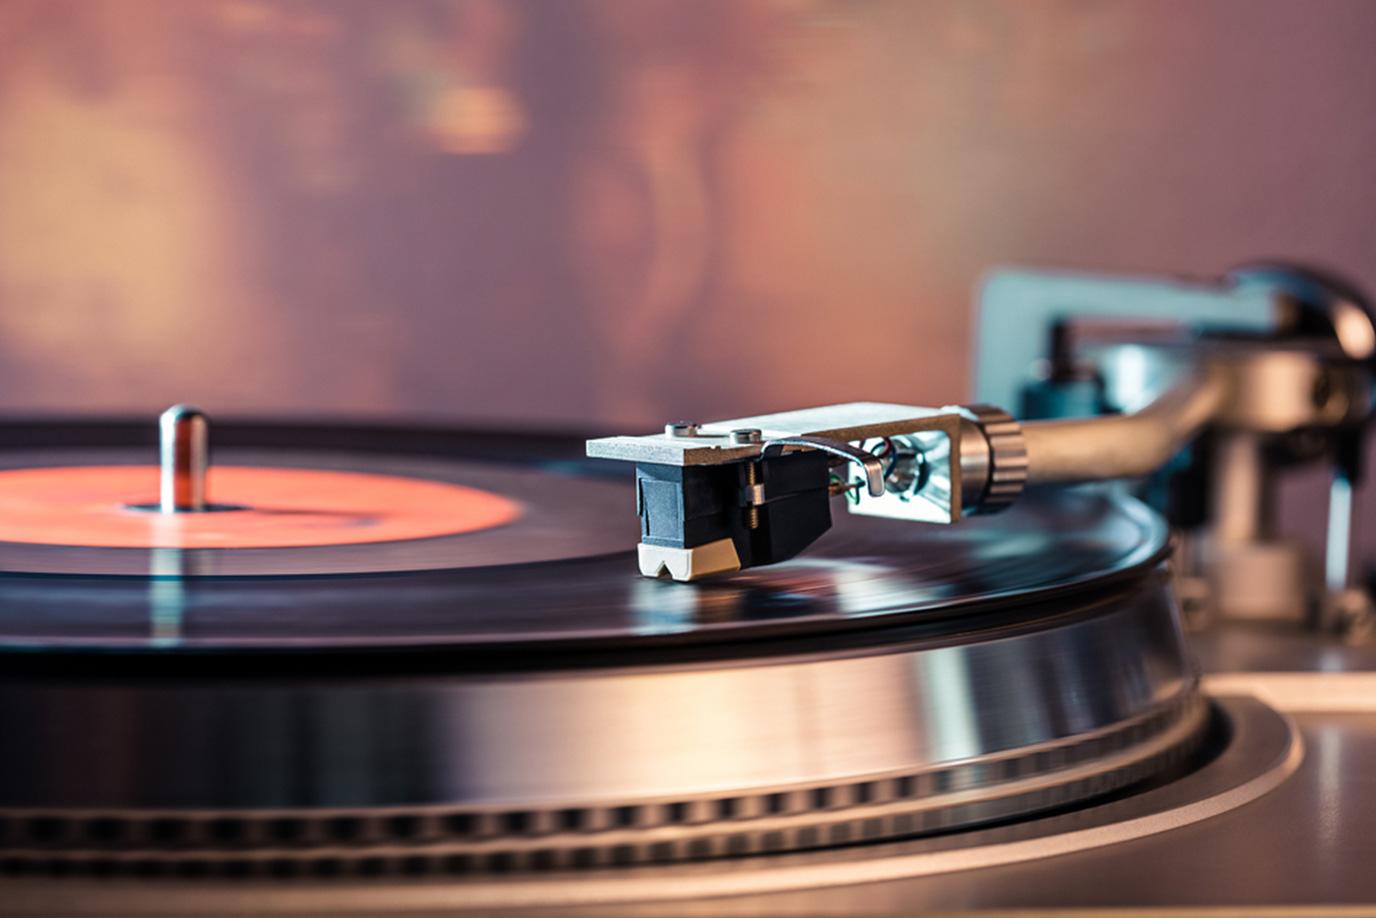 How to start your vinyl collection | Virgin Megastore